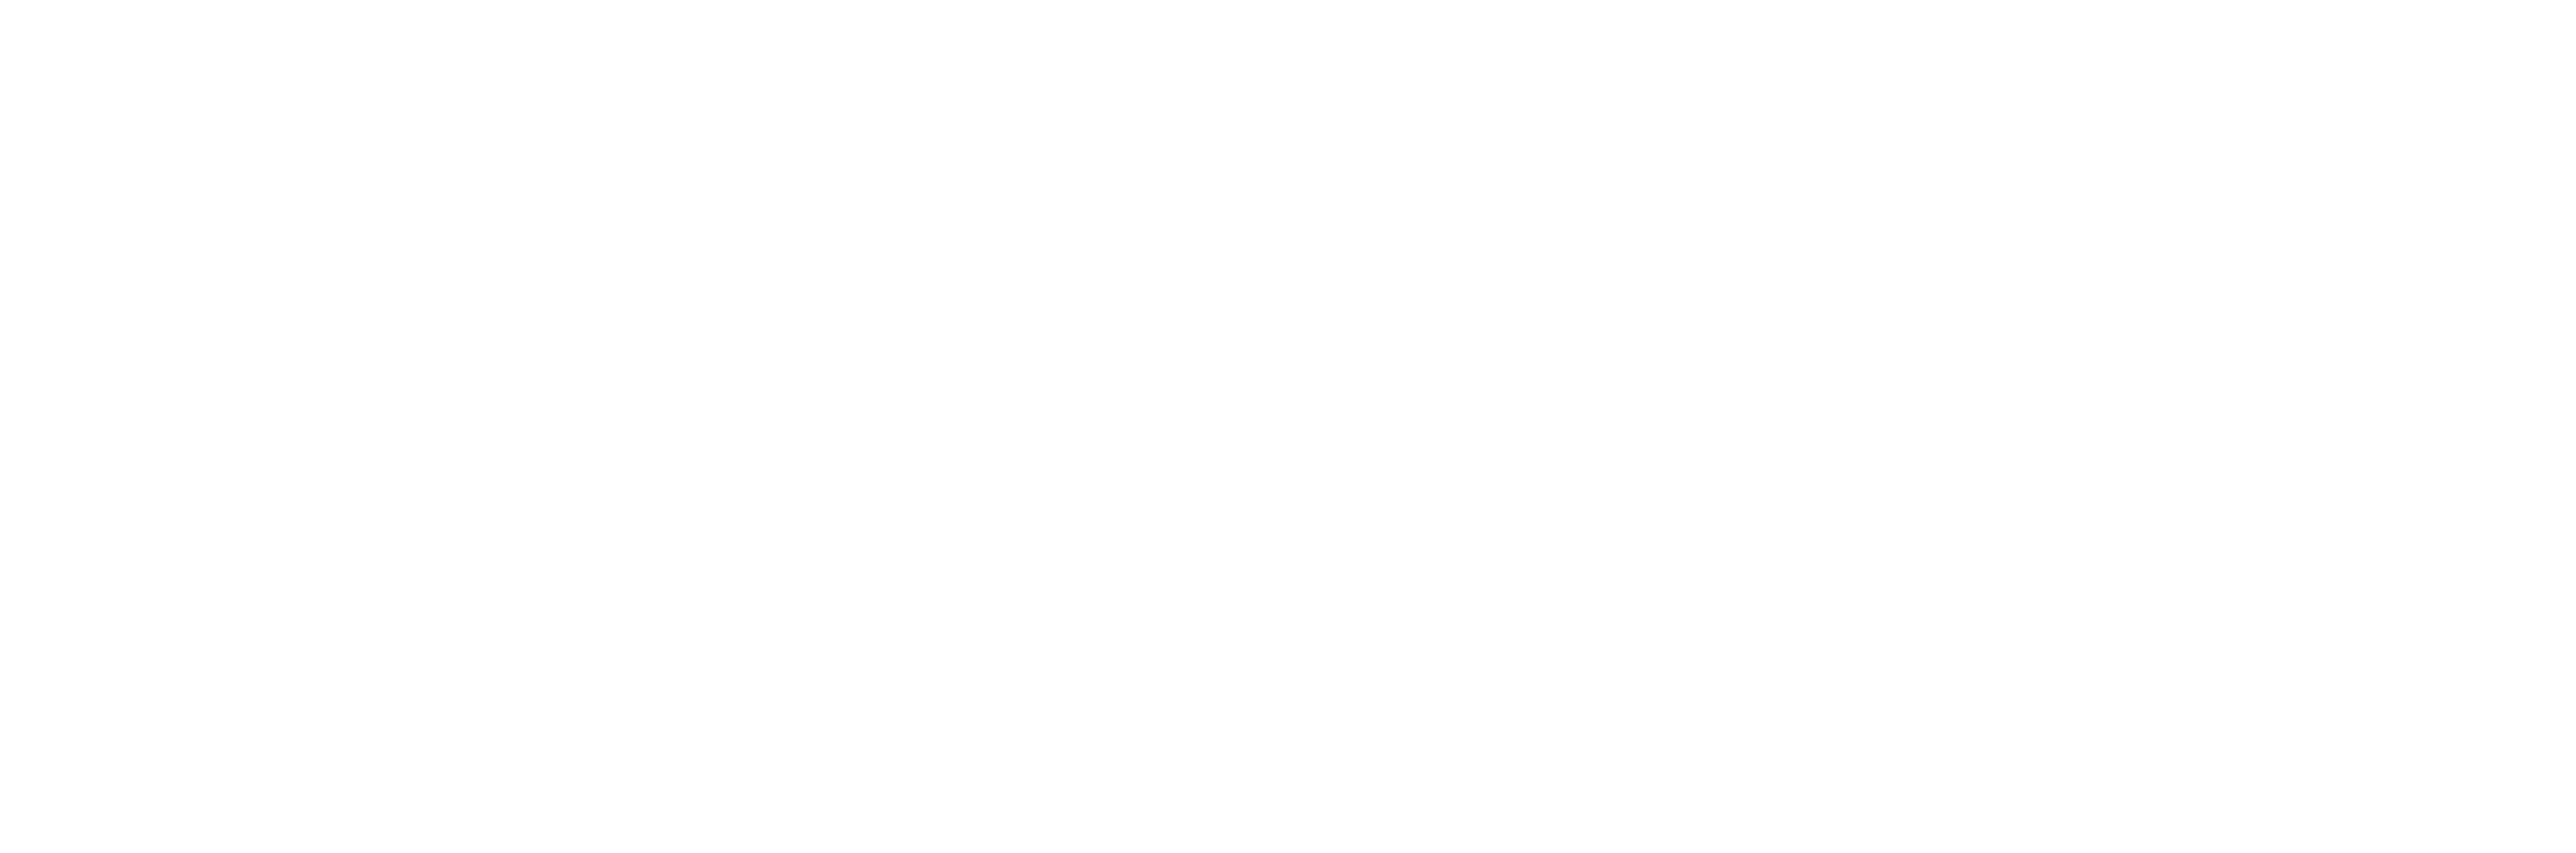 3_ara-logo+wits